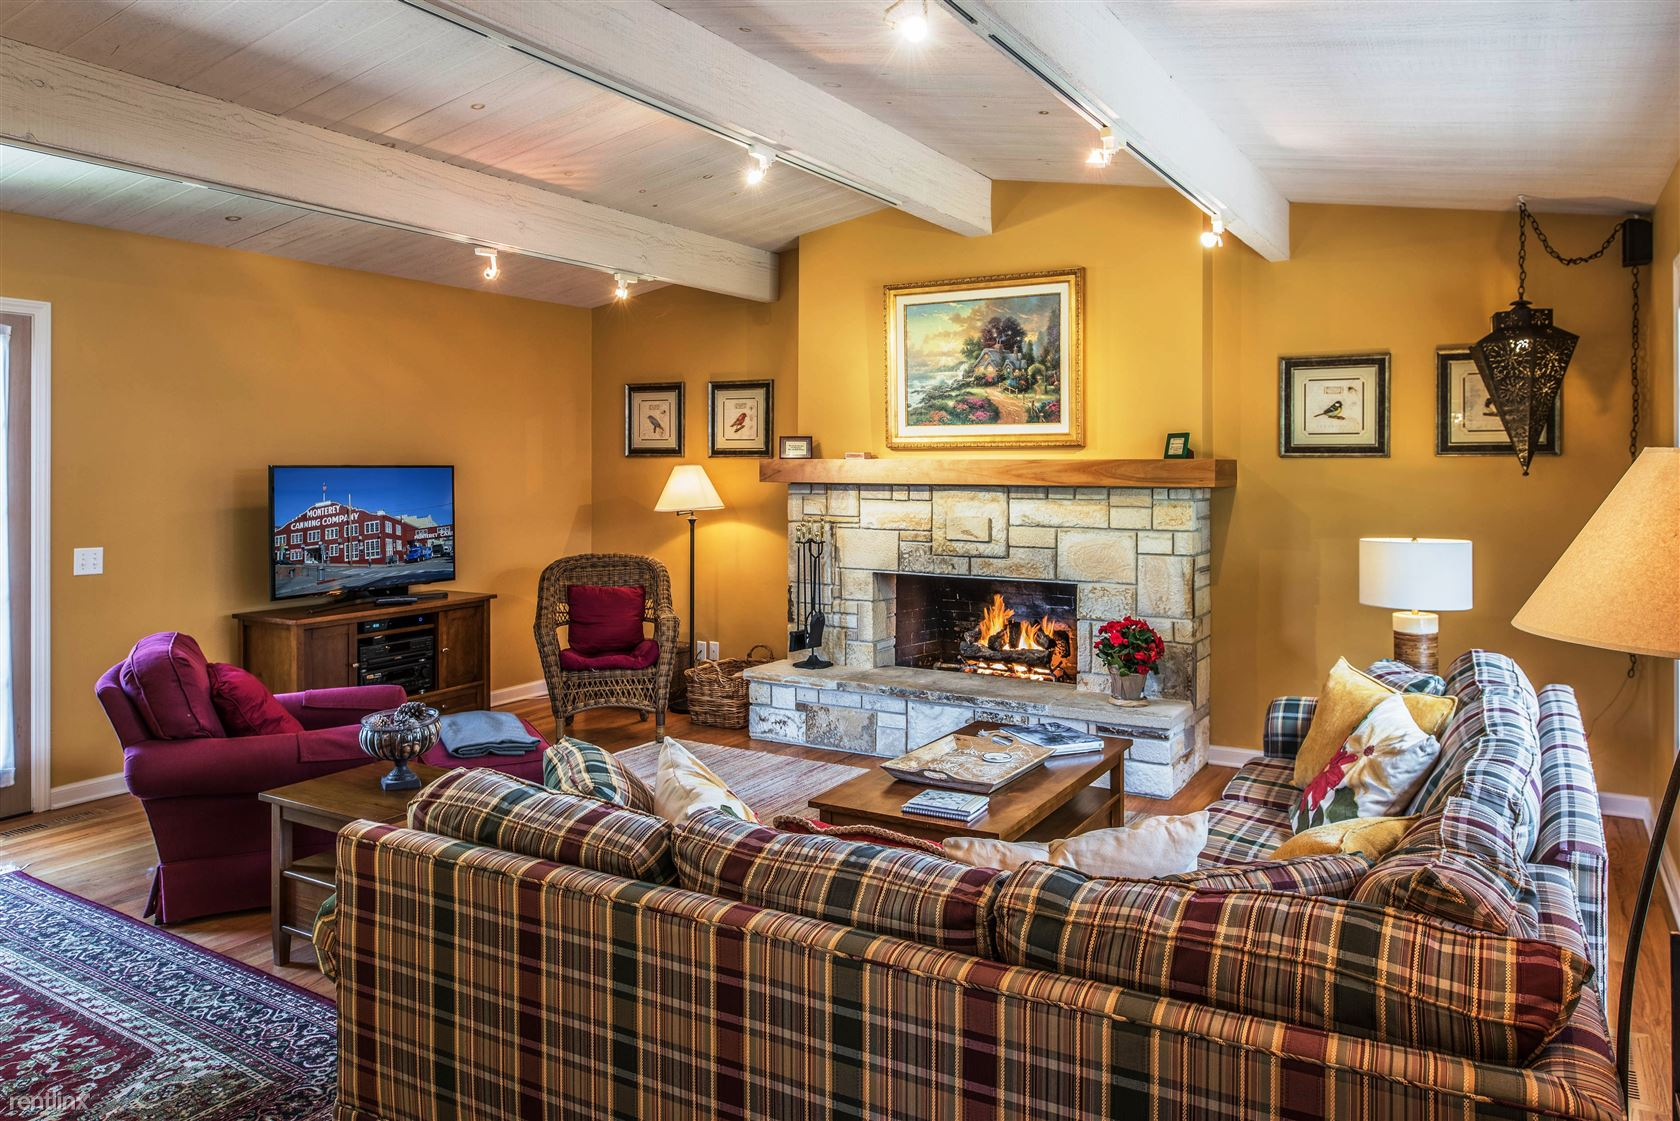 $5000 - $9000 per month , SE Corner of San Carlos and Alta, 3744 Ten Place